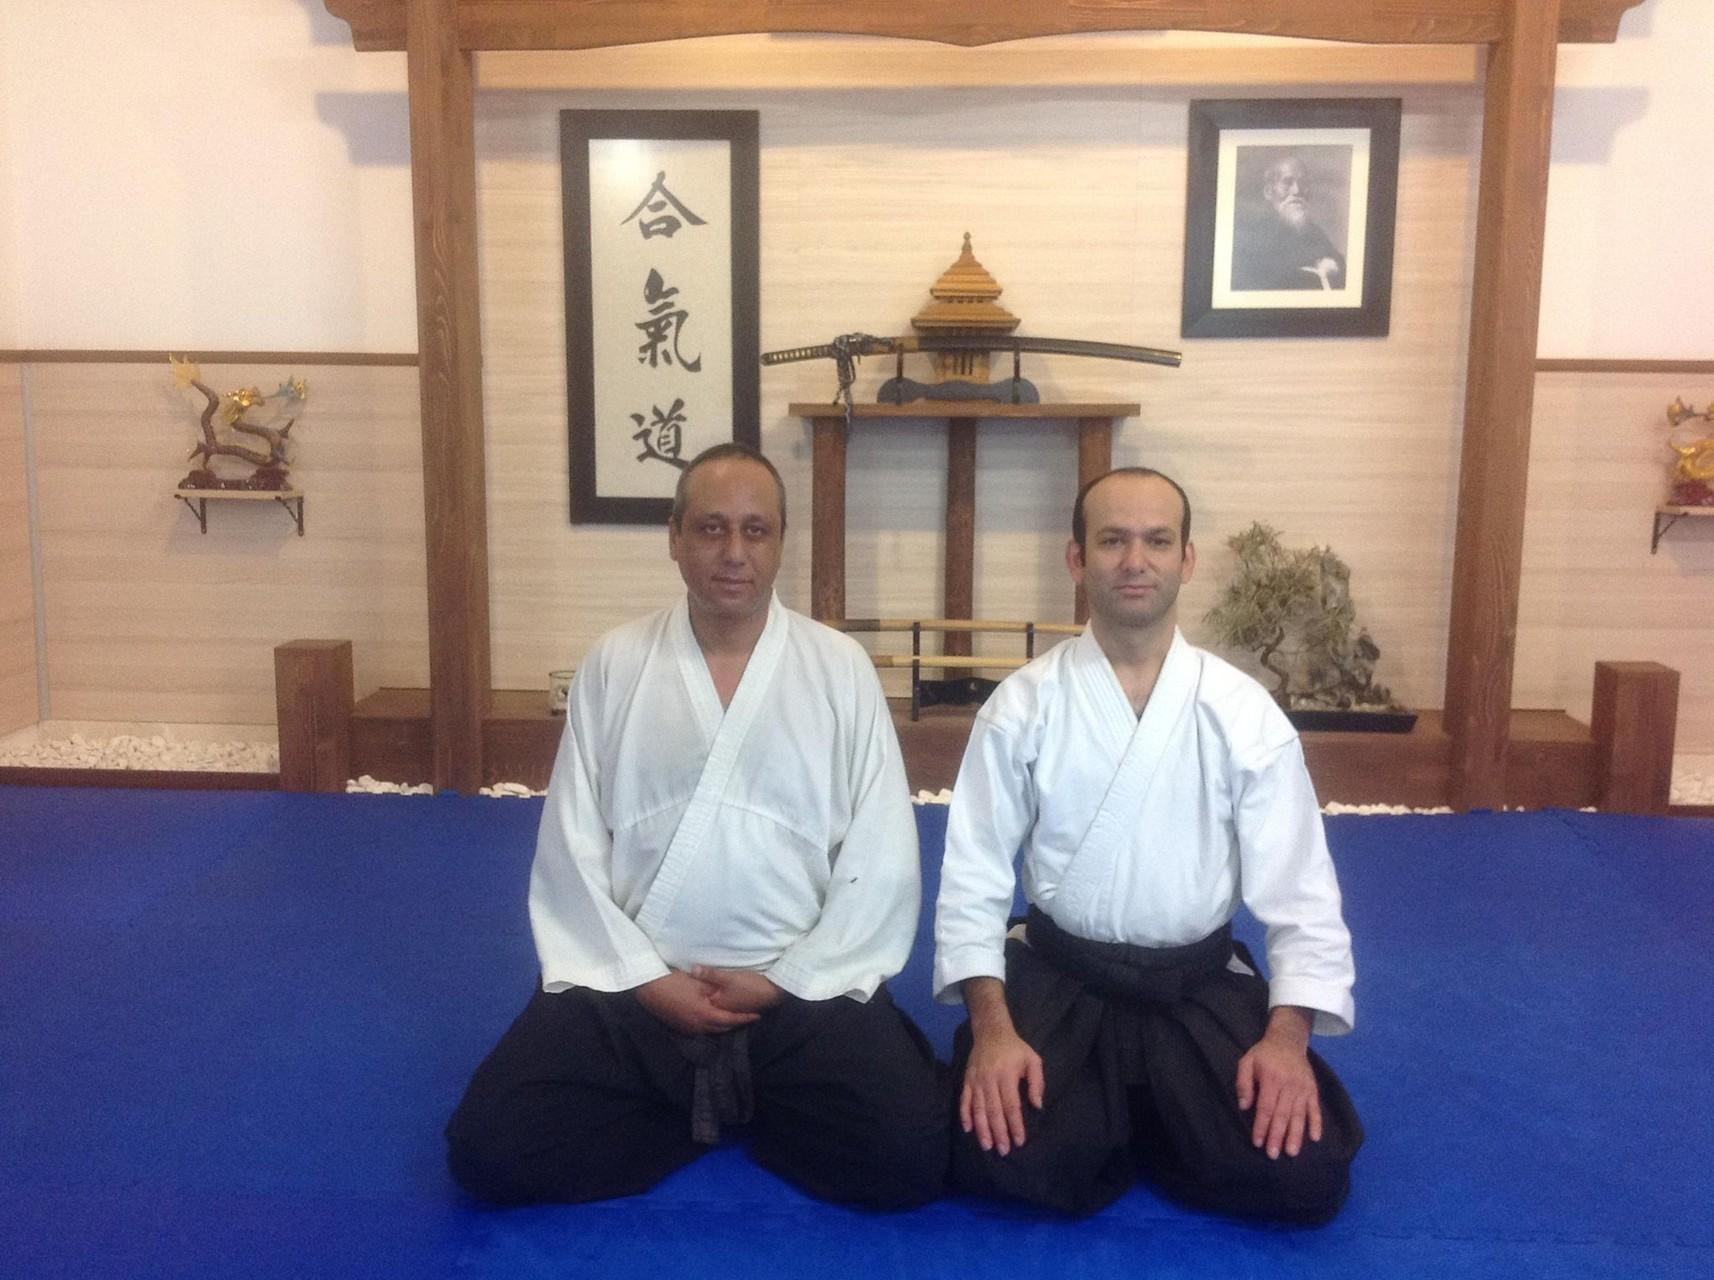 Visite du dojo de Aikikai Ankara avec le maitre Oğuzhan YILMAZ élève de Ayhan KAYA Sensei